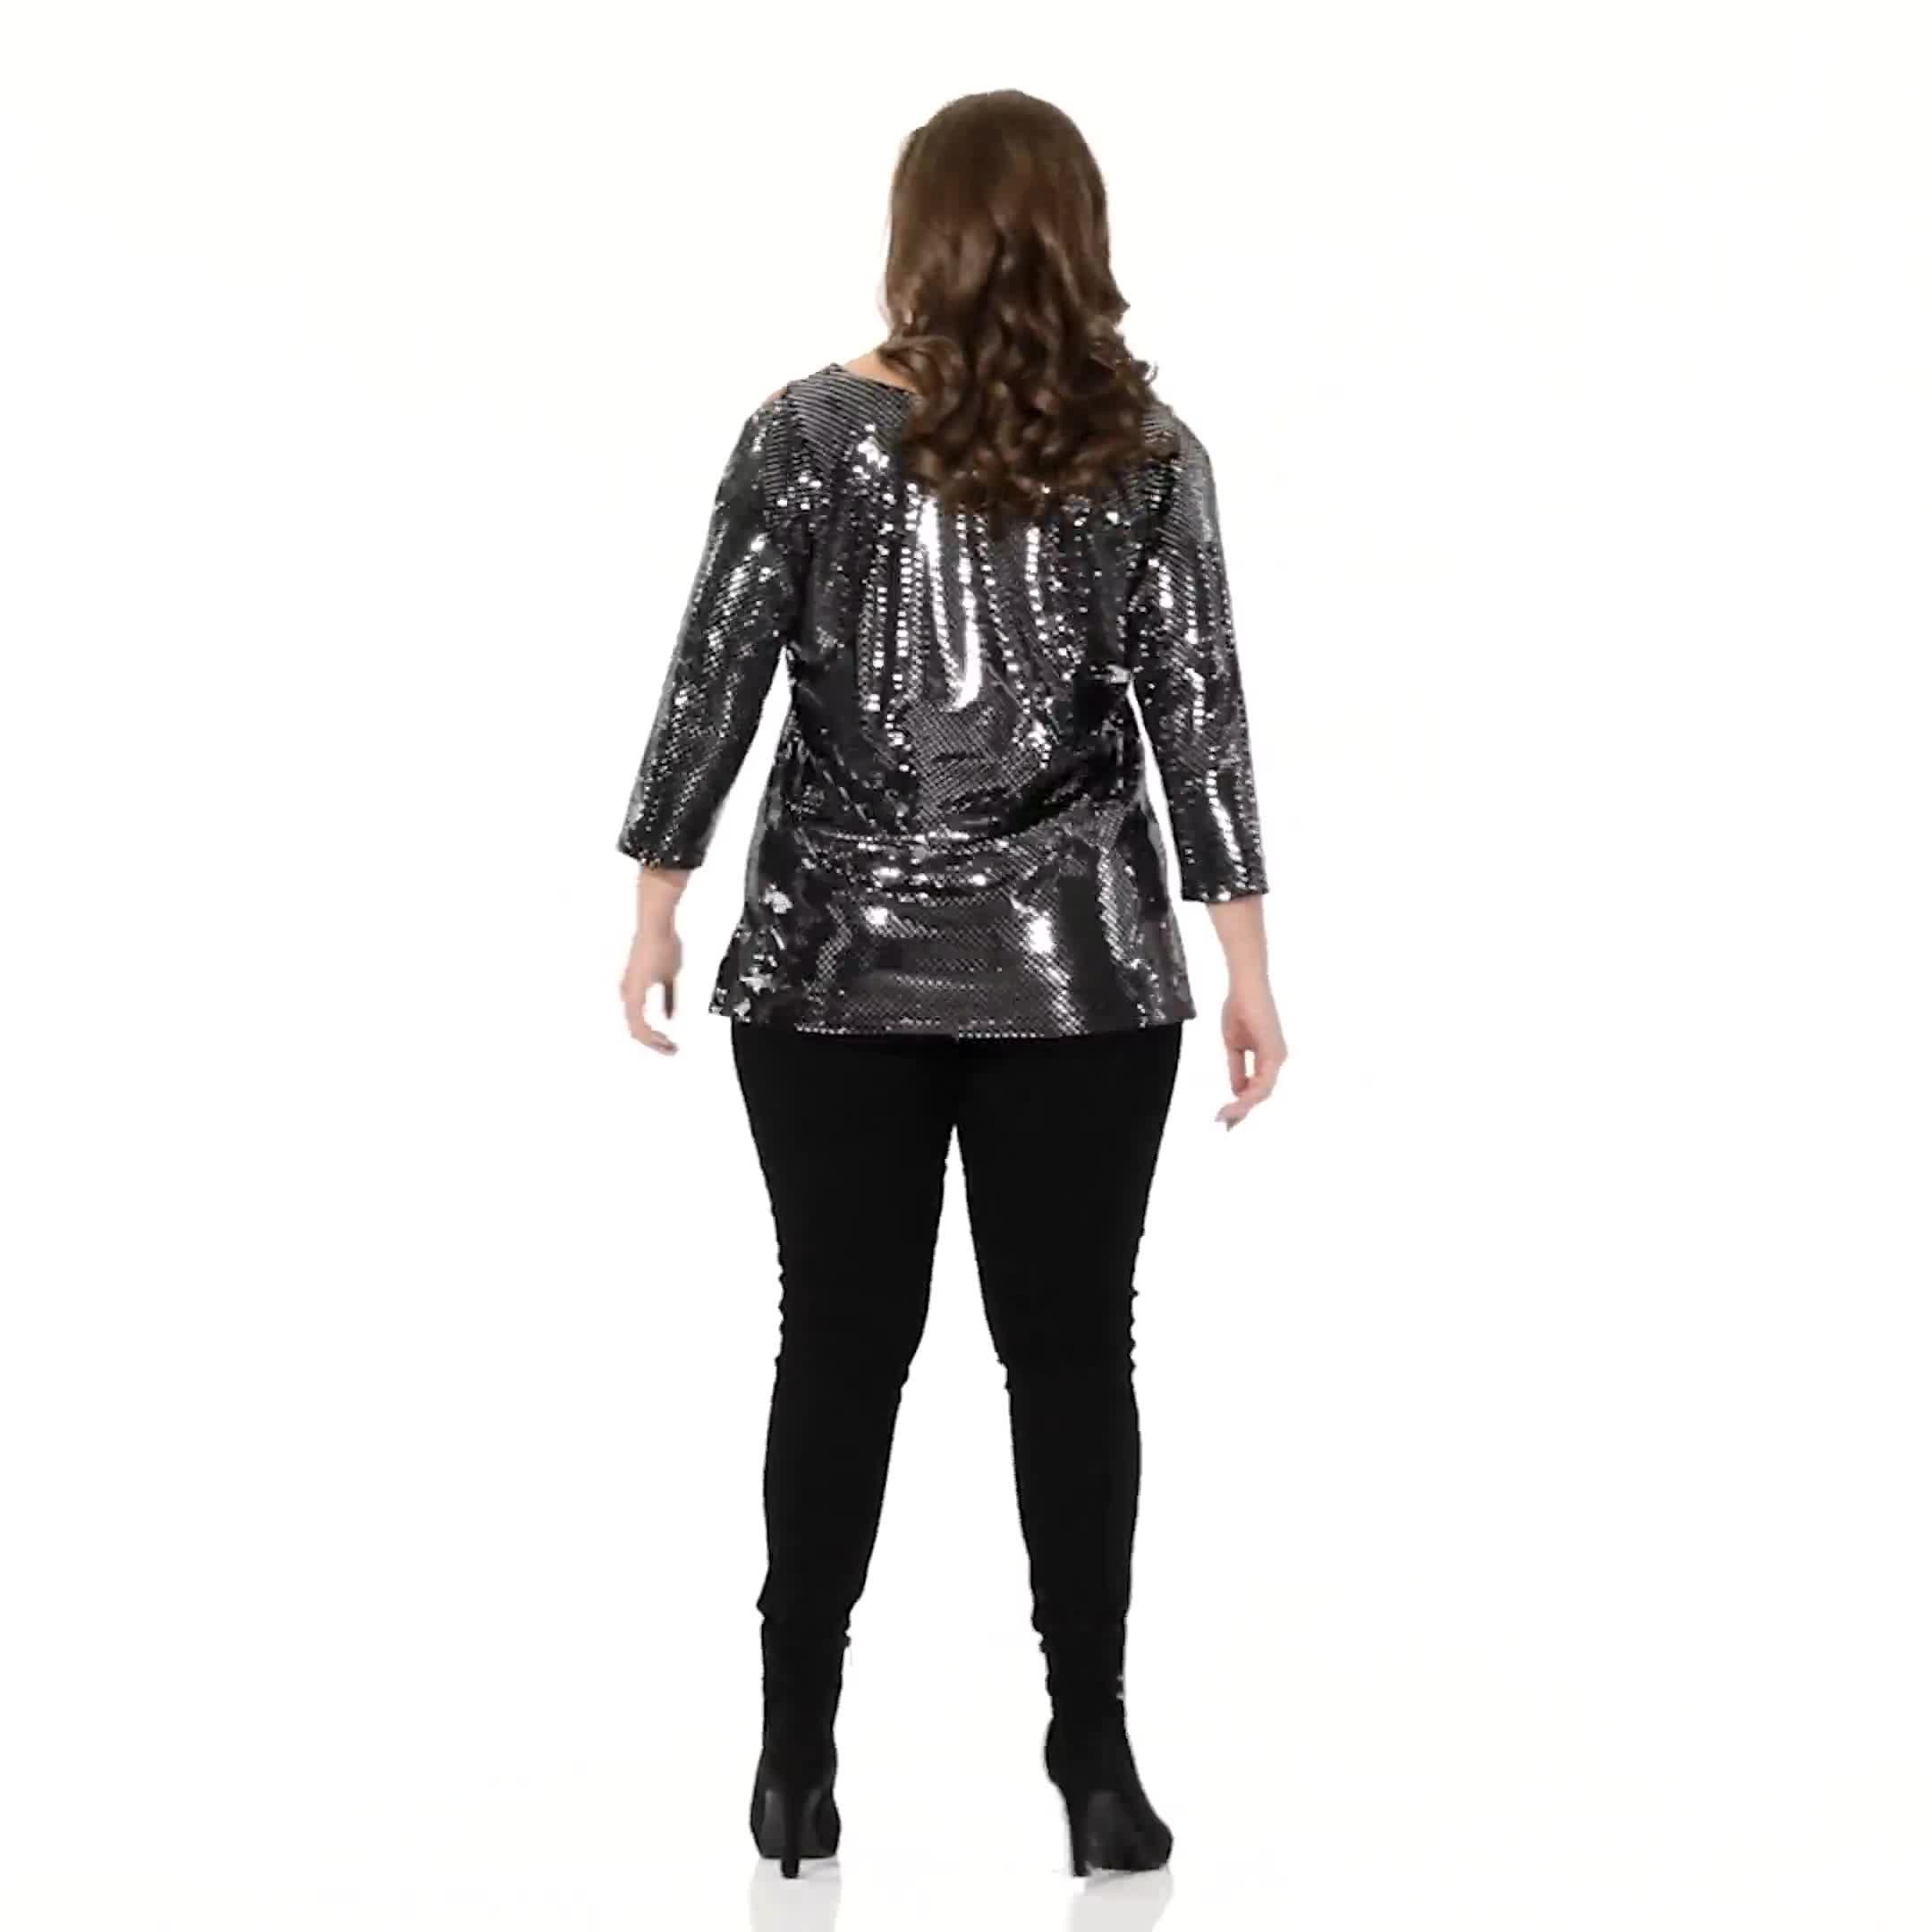 Roz & Ali Cold Shoulder Metallic Knit Top - Plus - Video